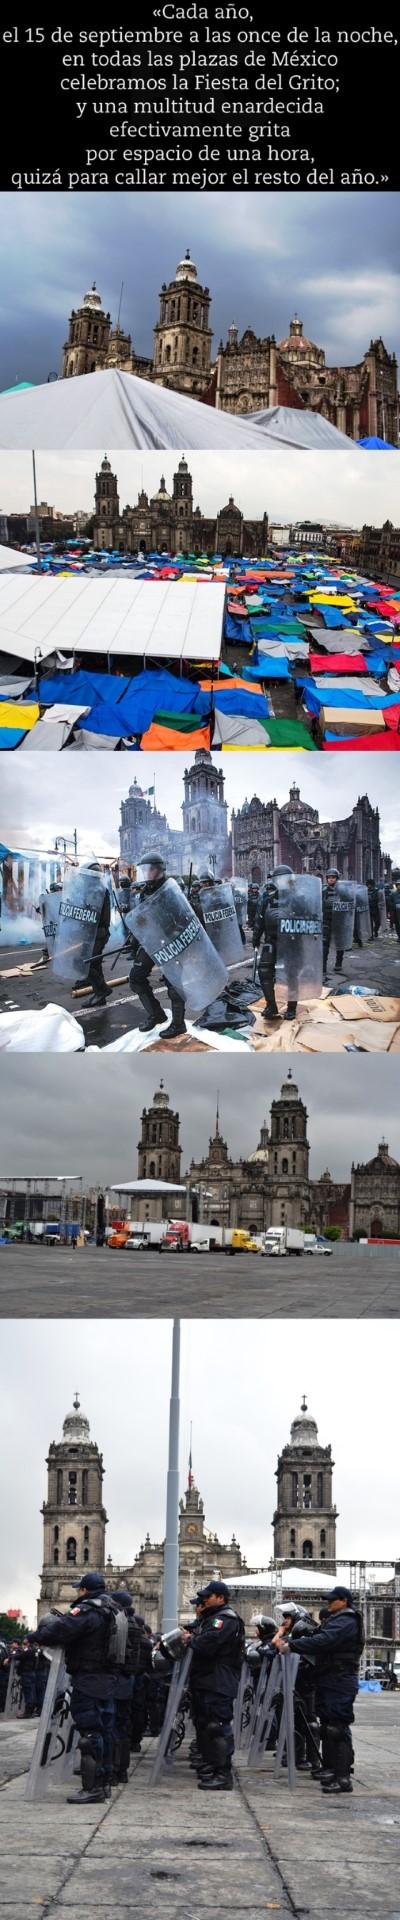 Octavio Paz 15S foto zocalo 500px (Large)